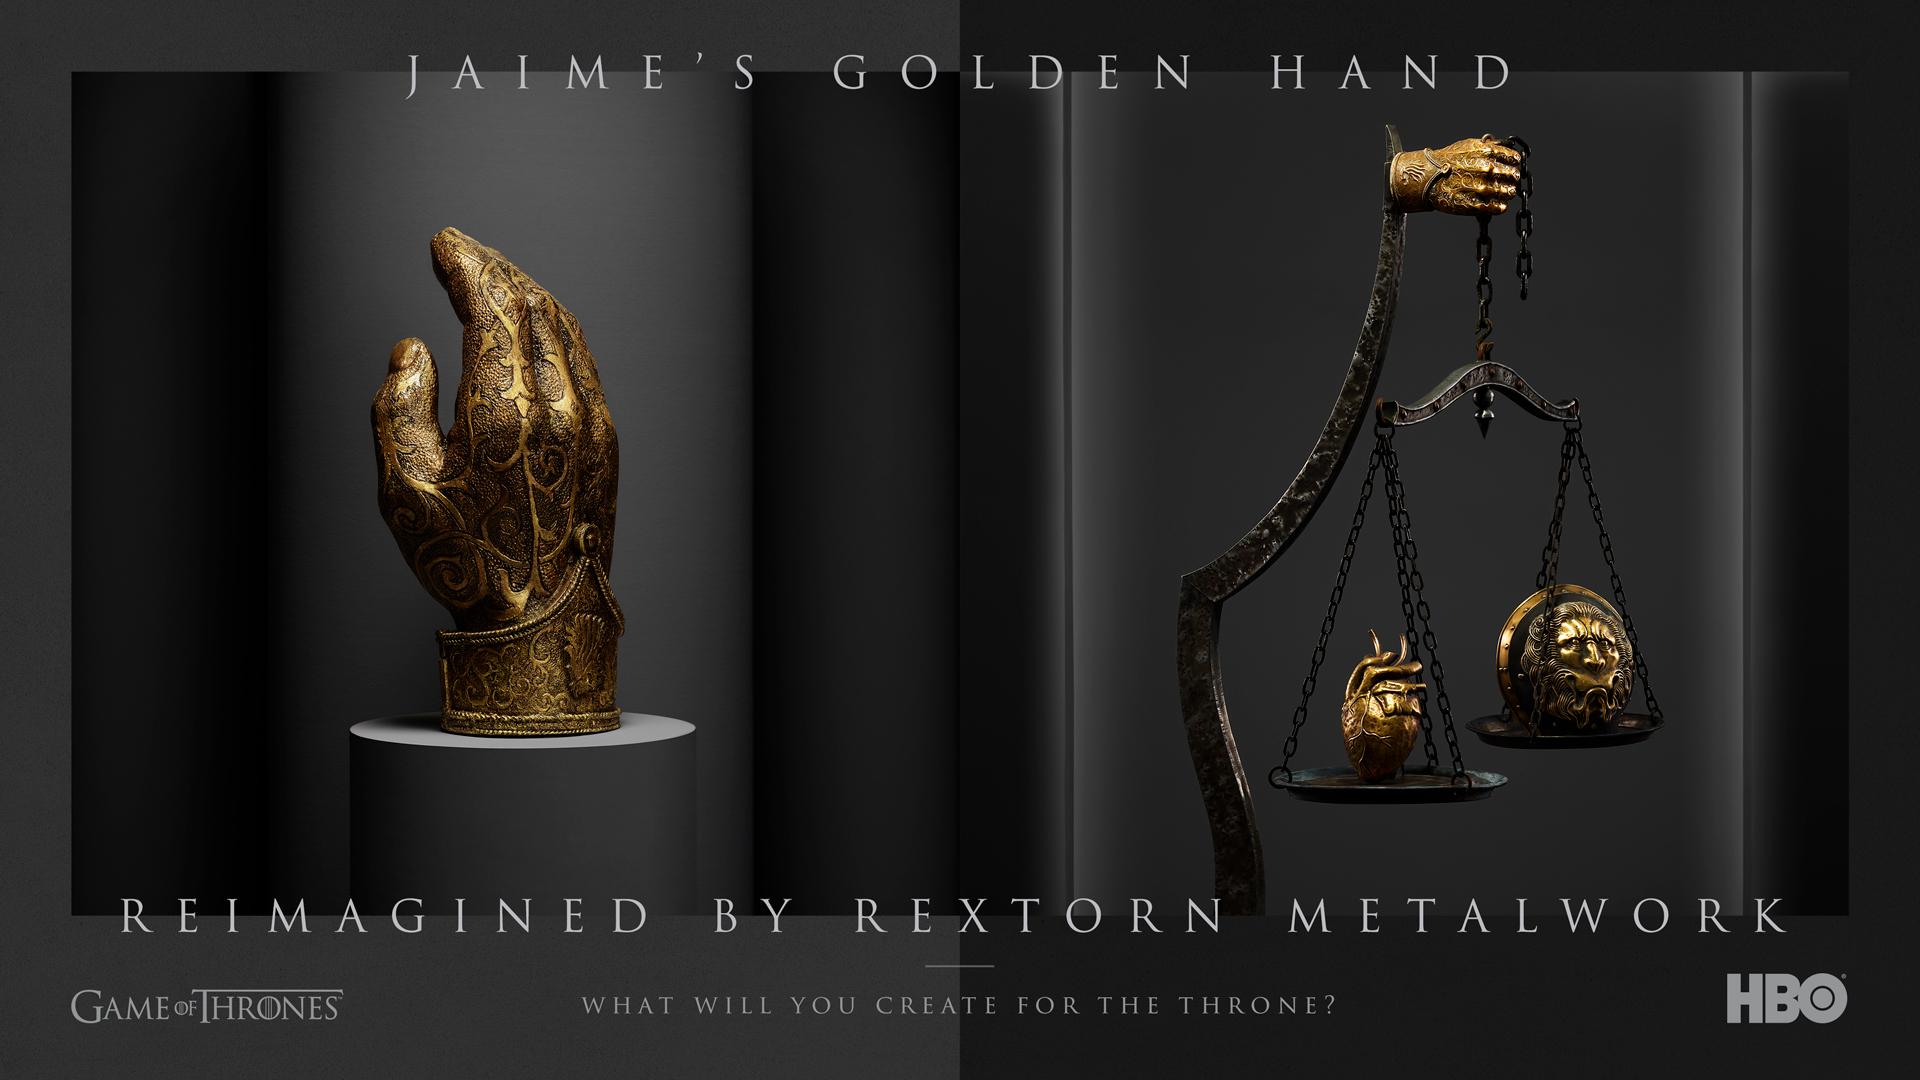 04_GOLD_Jaimes_Golden_Hand_Rextorn_Metalwork.jpg